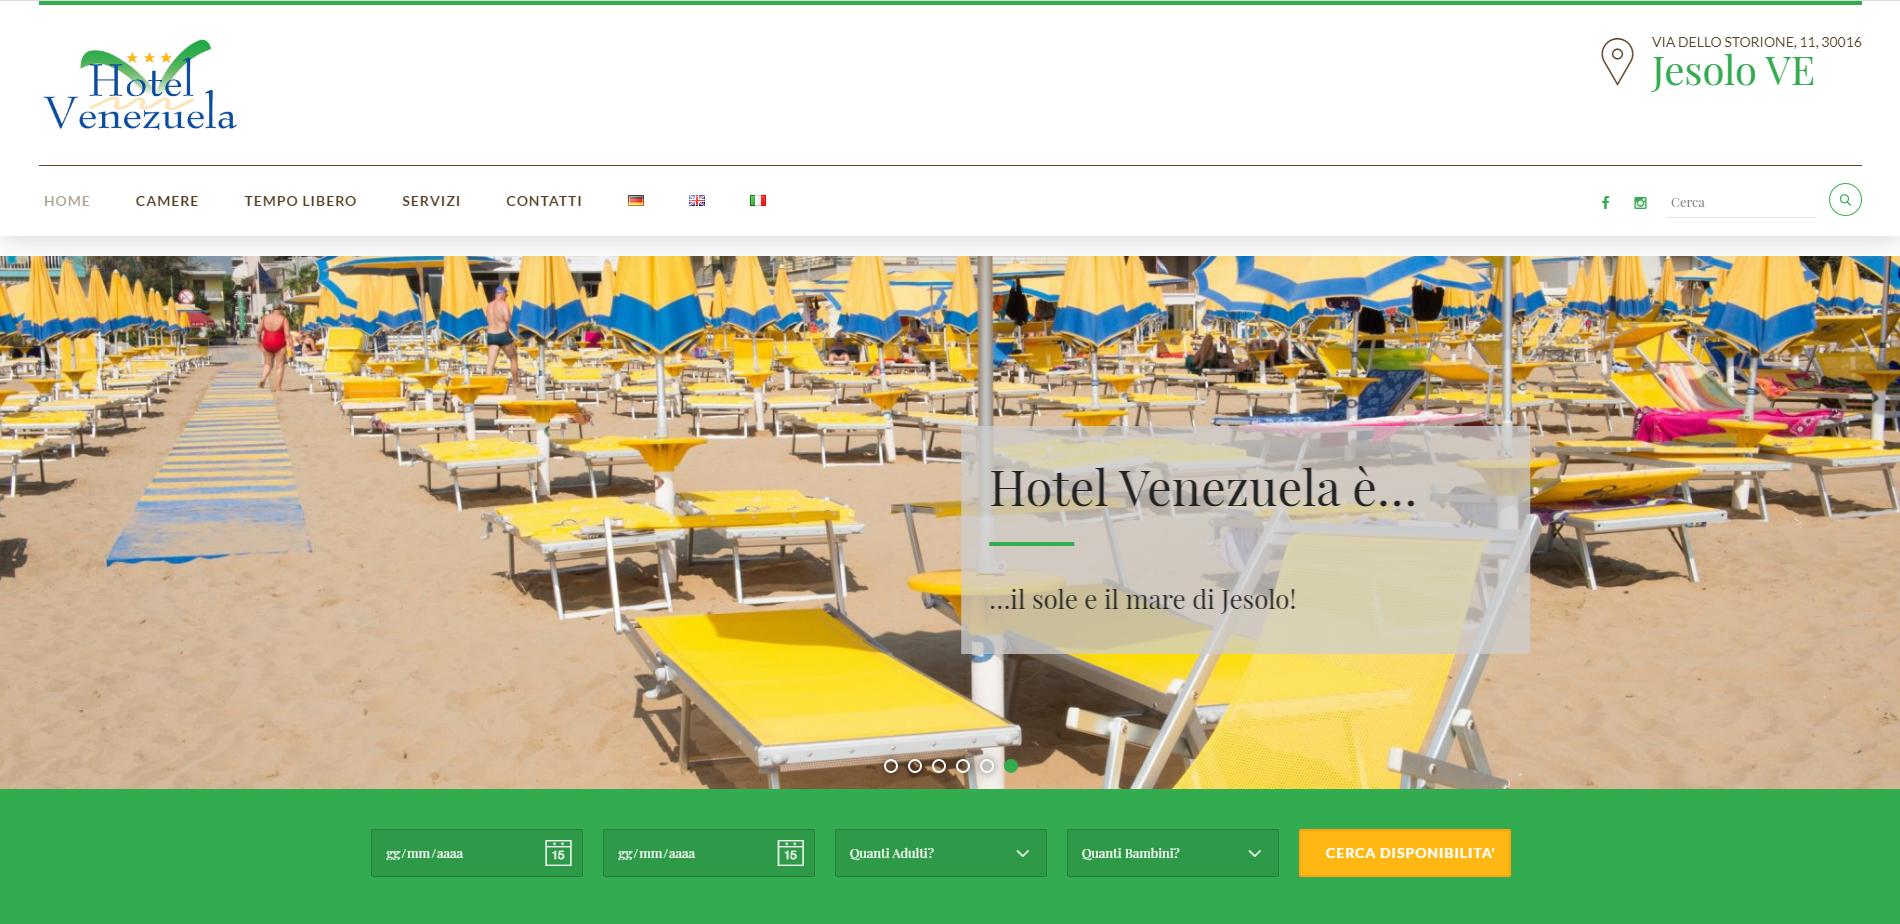 schermata home page sito www.hotelvenezuela.it